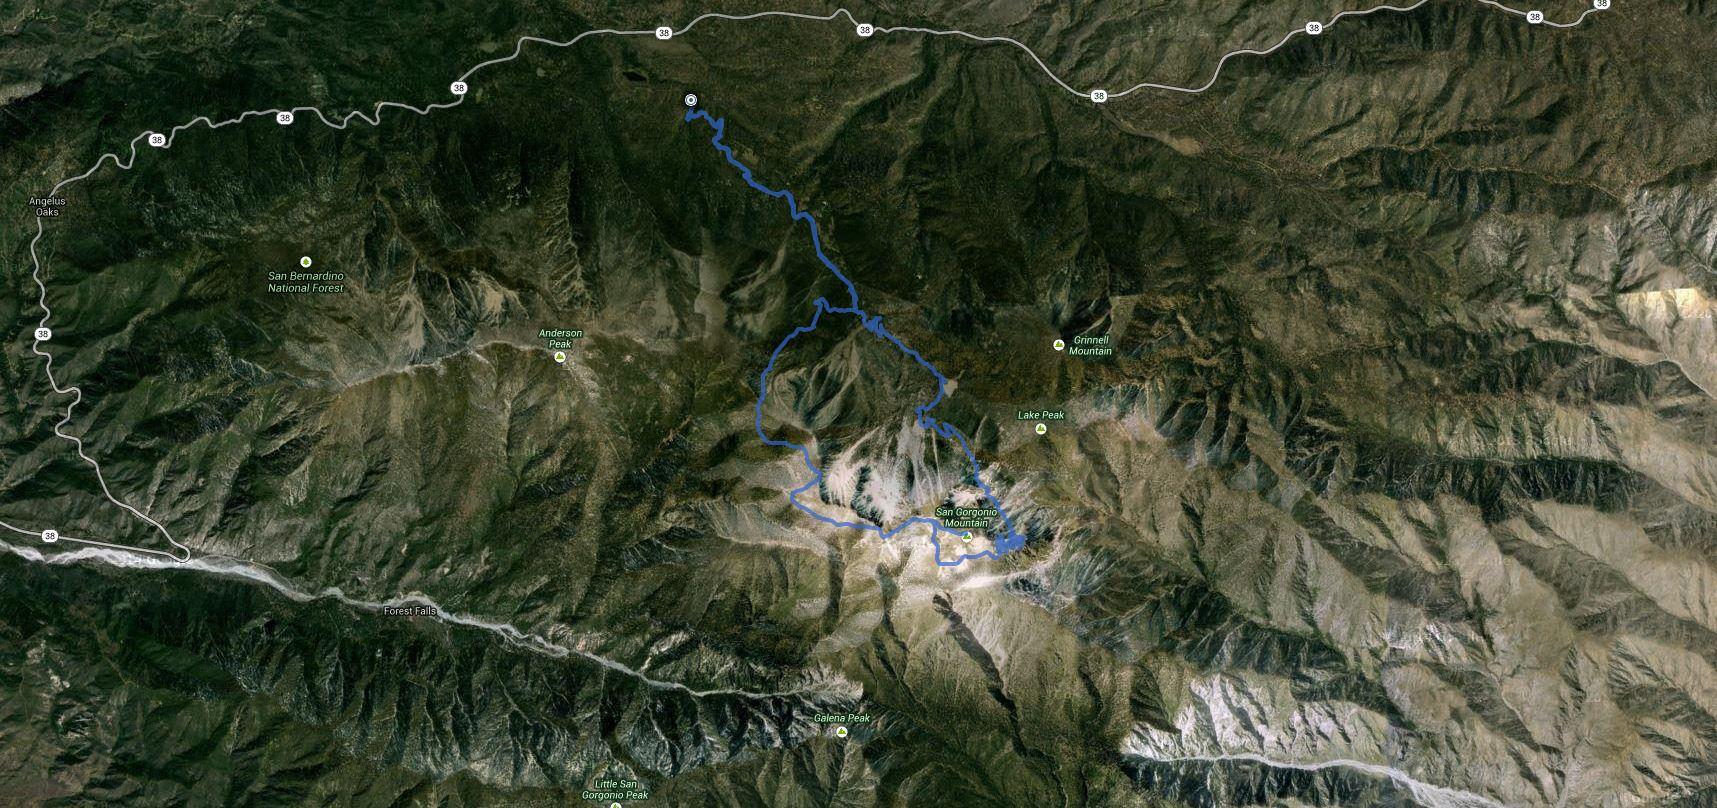 San Gorgonio Mountain – Loop – Up via Dry Lake, Down via Dollar Lake – GPS Track